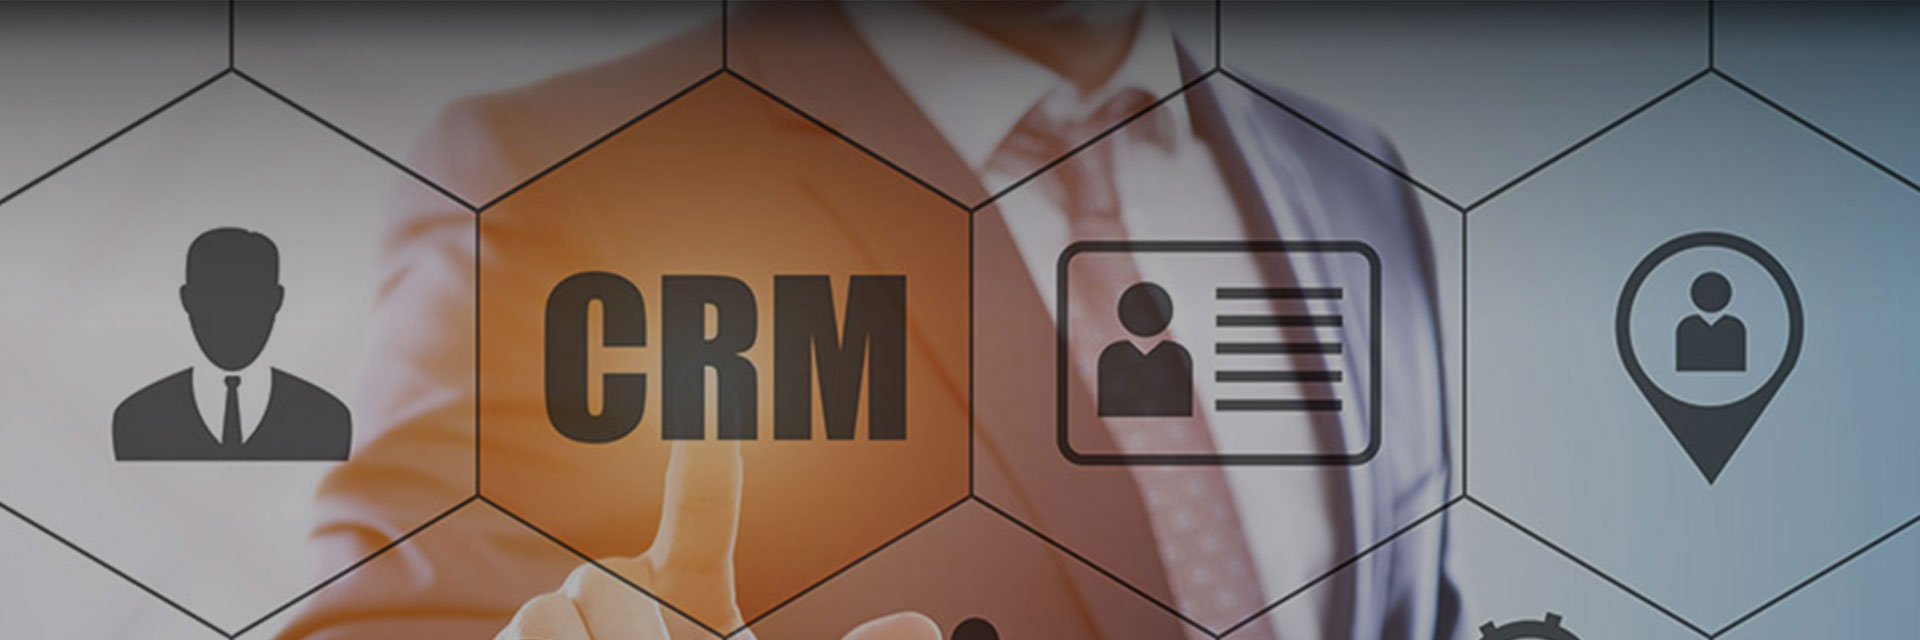 Parmis Star Customer Relation Management (CRM) ERP Software